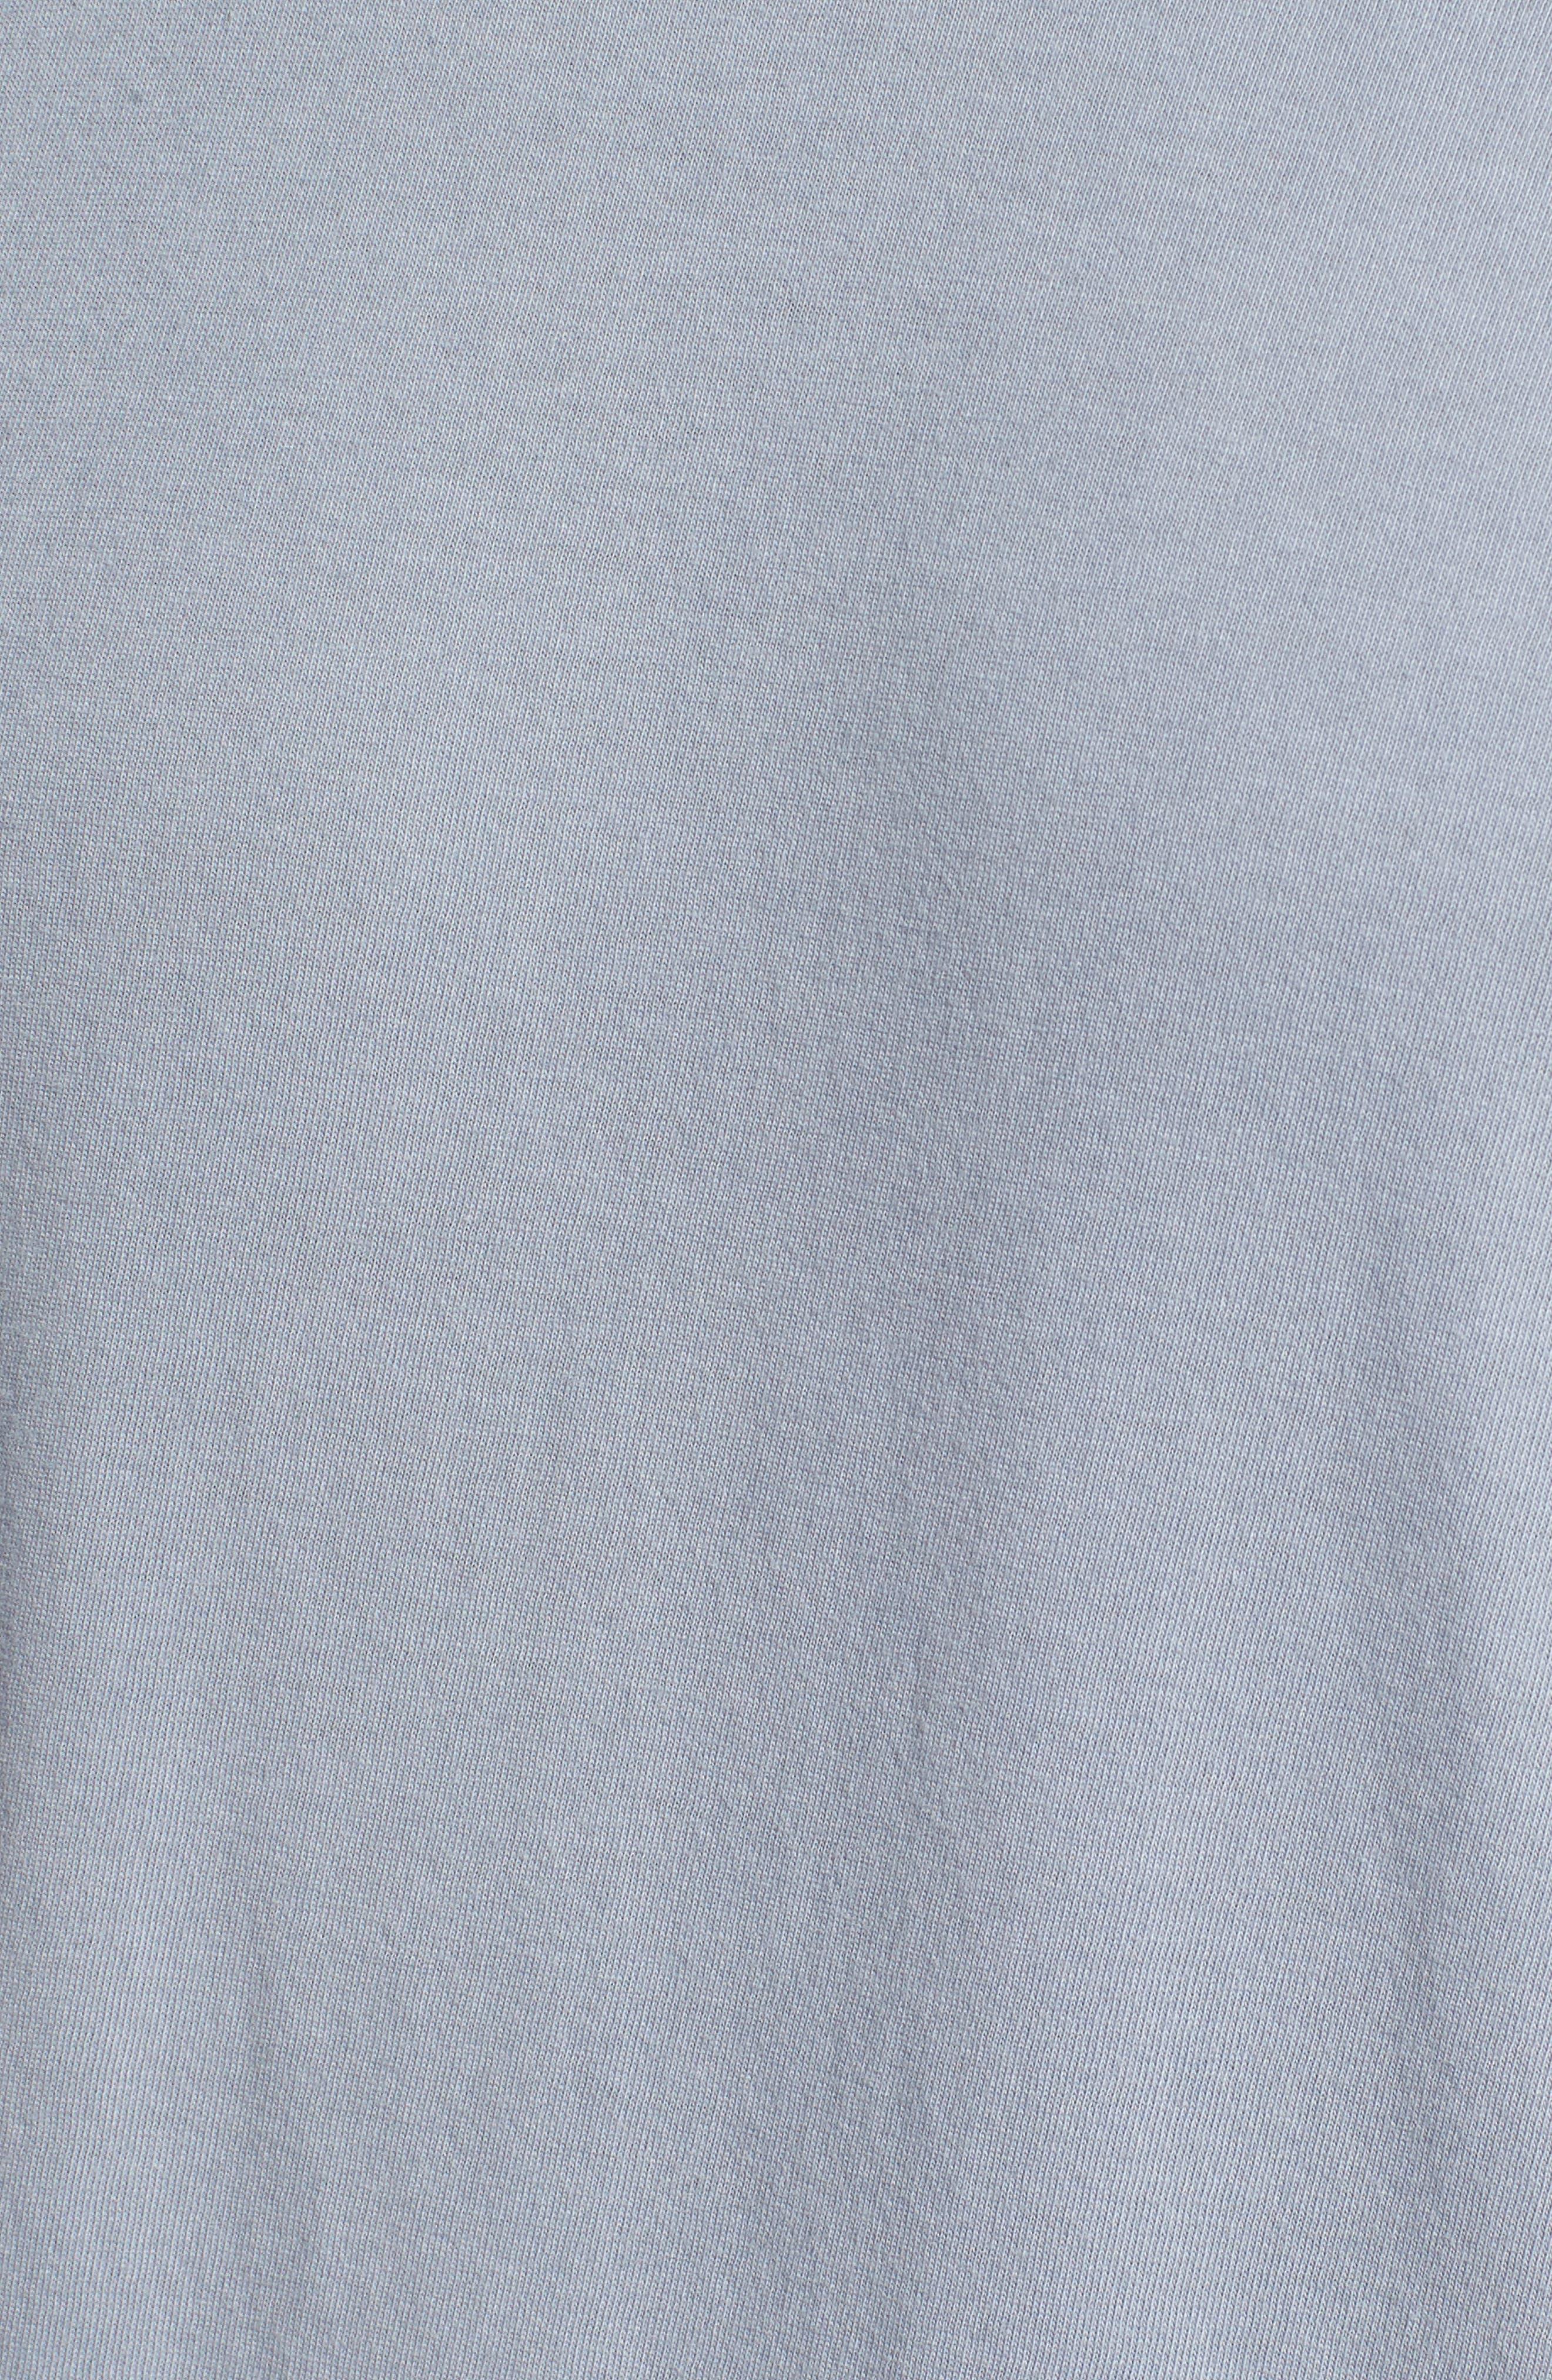 Crewneck Jersey T-Shirt,                             Alternate thumbnail 428, color,